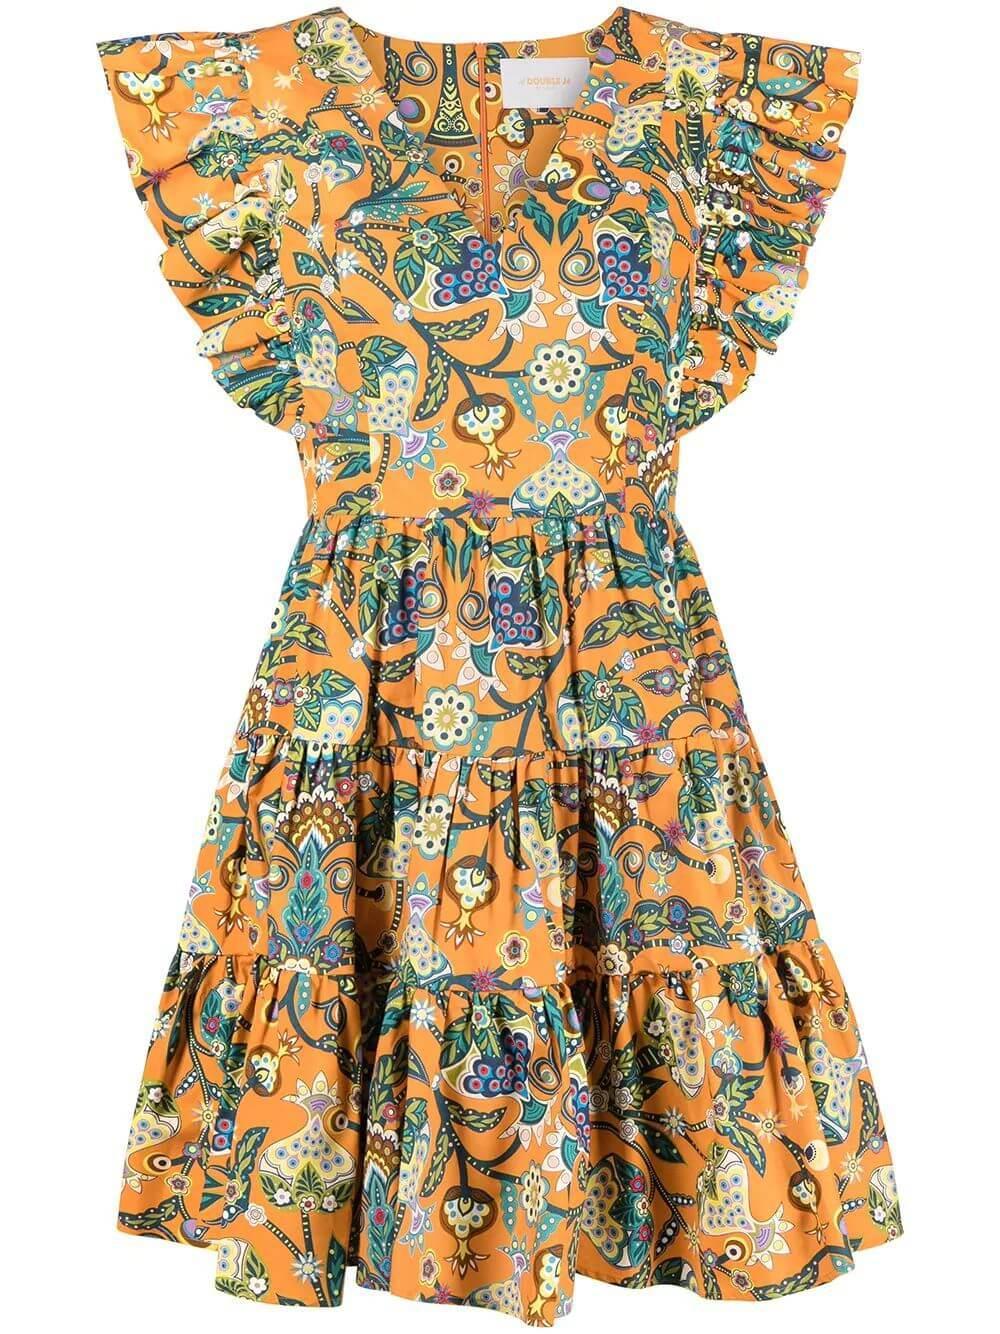 Honeybun Floral Dress